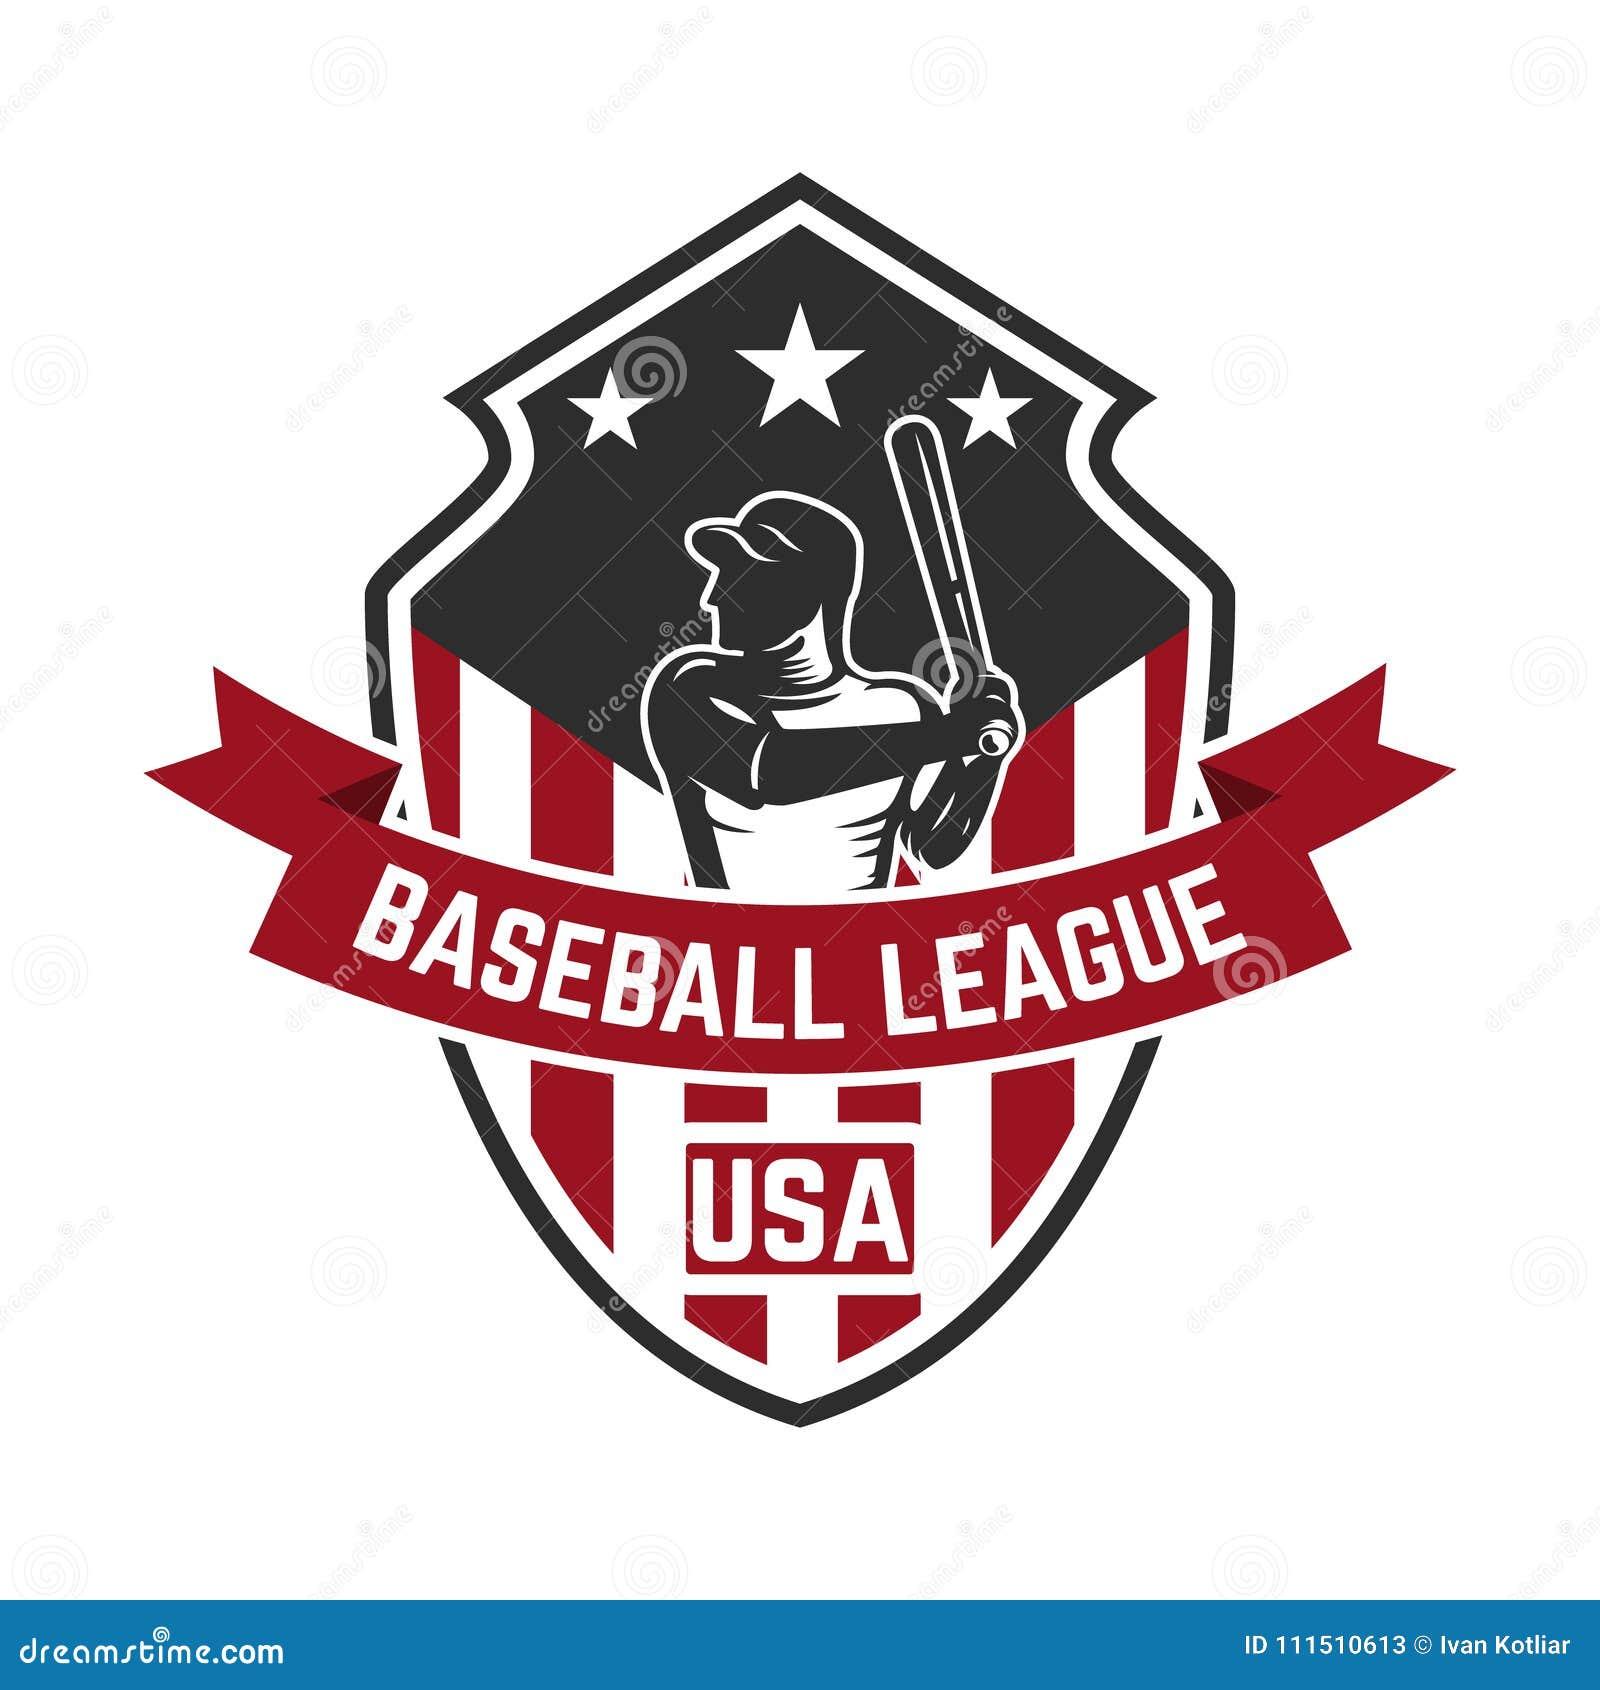 Emblem Template With Baseball Player Design Element For Logo Label Sign